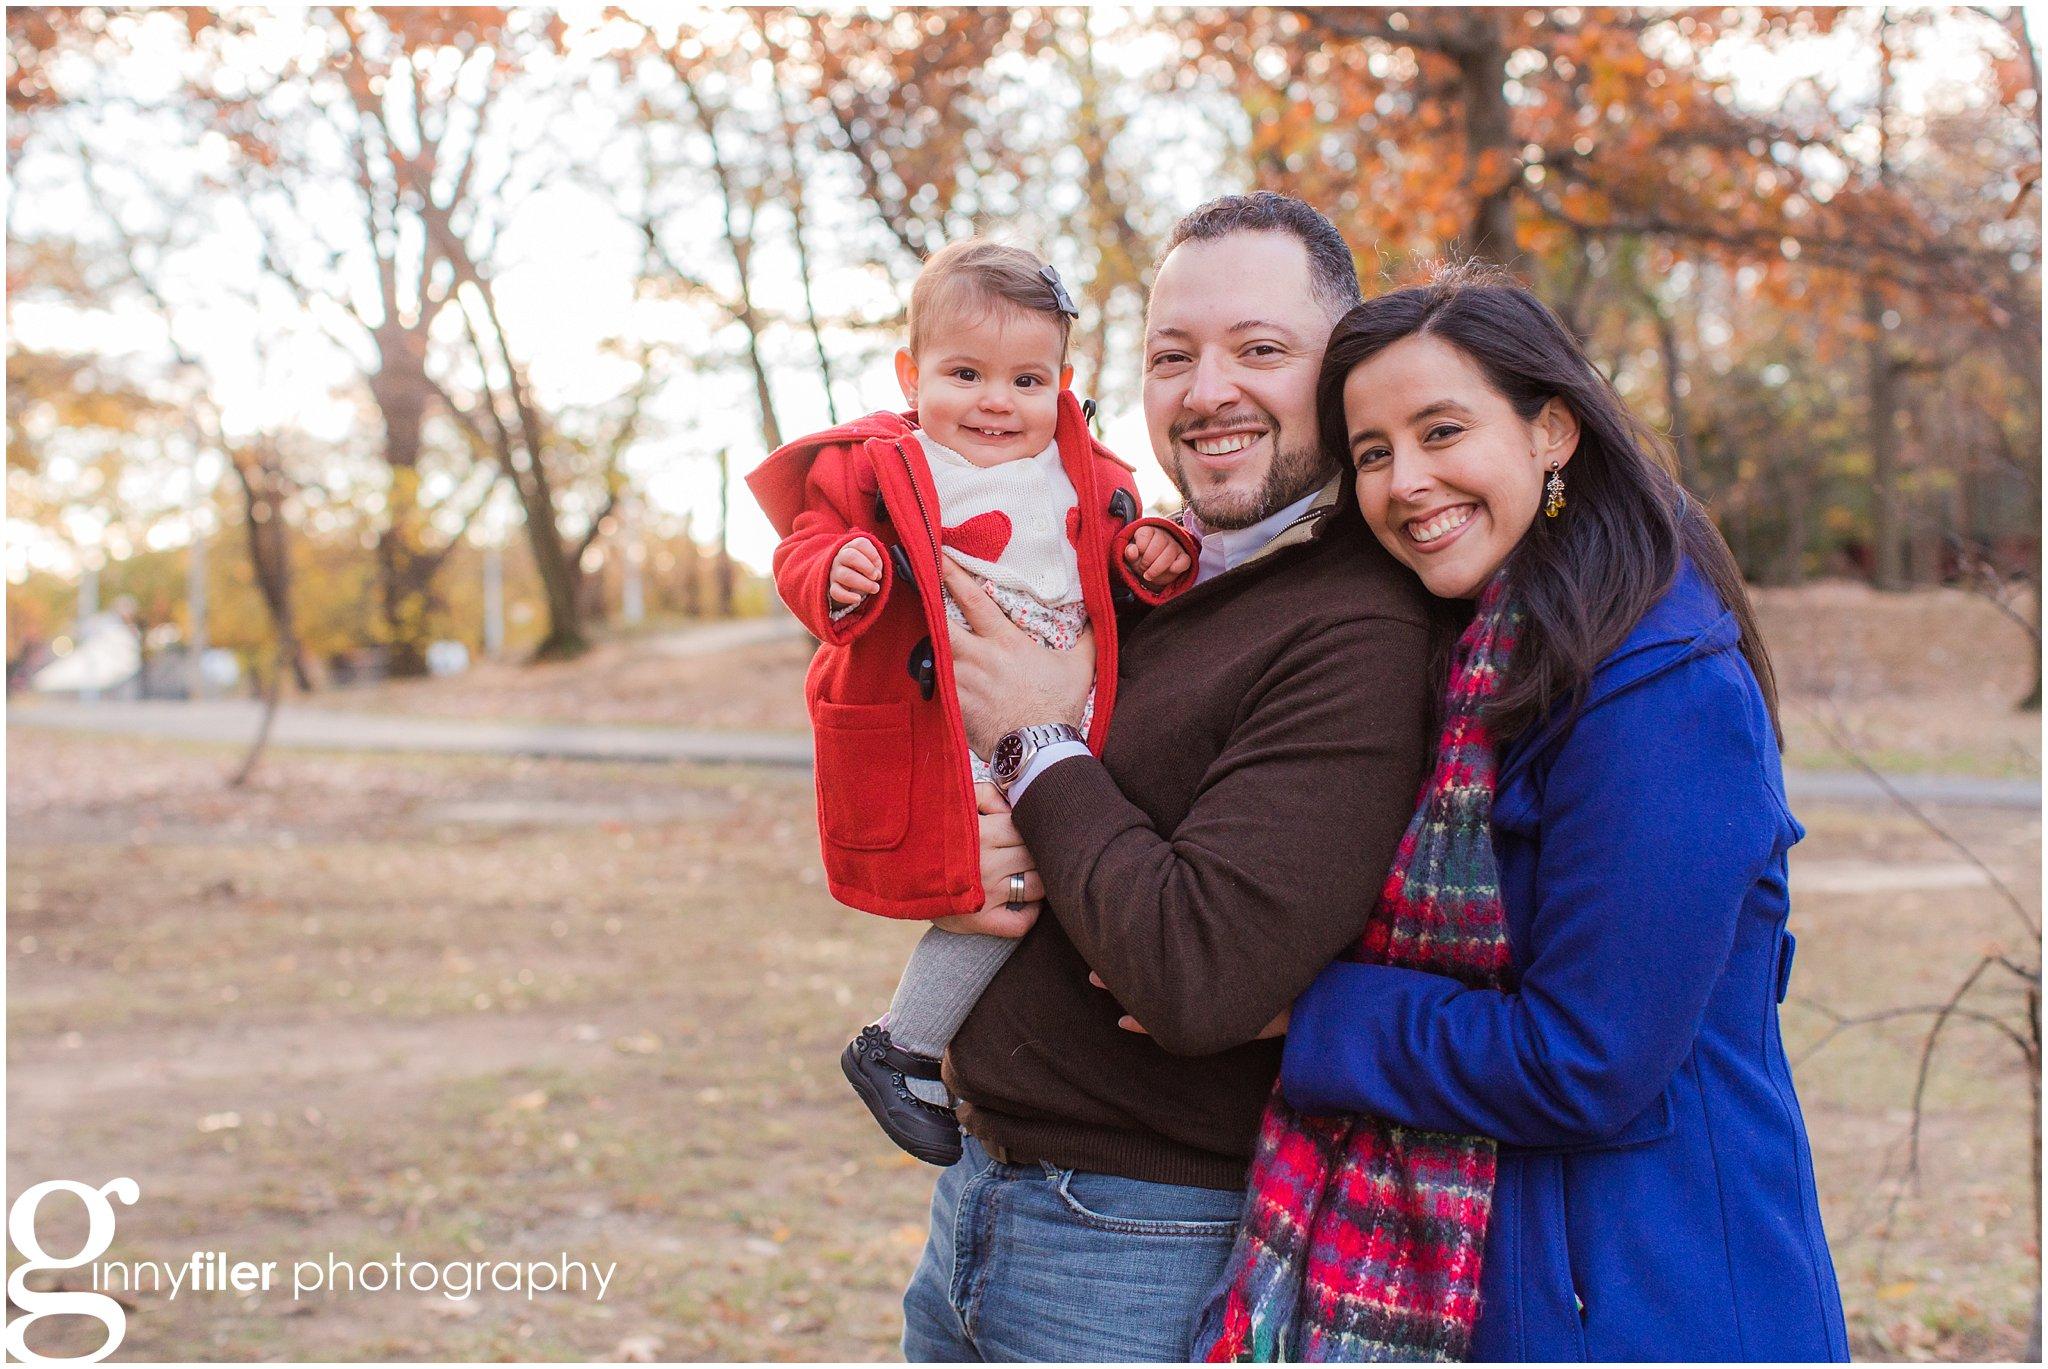 family_photography_Sanchez_0009.jpg